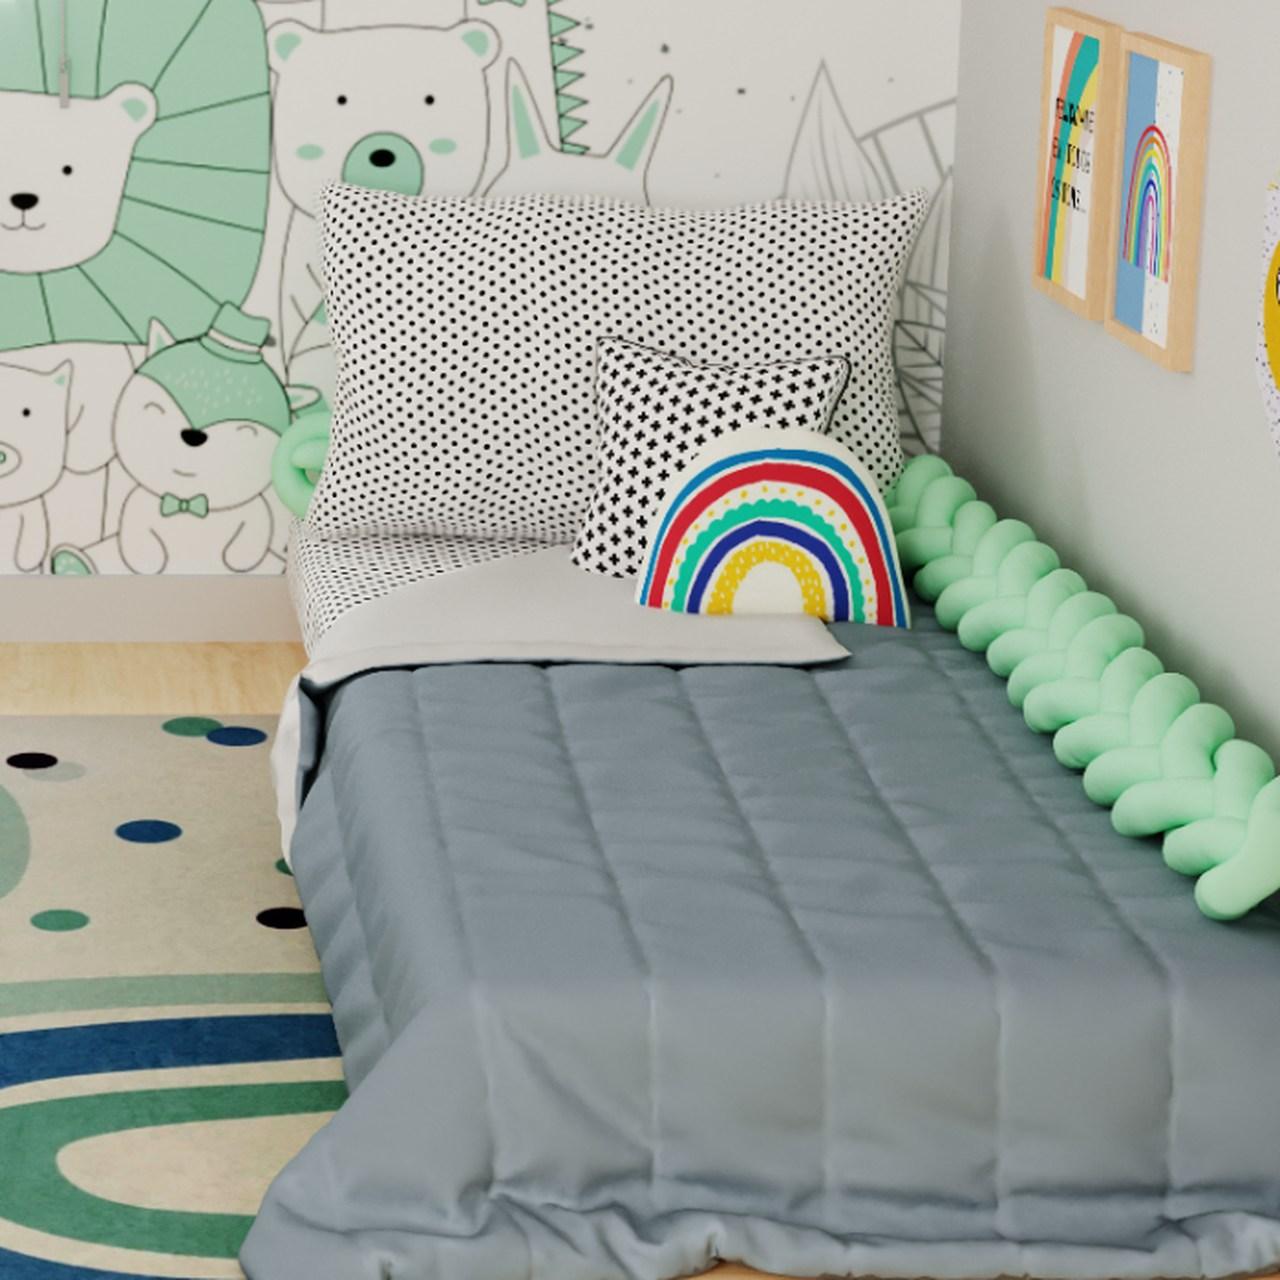 Edredom mini cama dupla face 100% algodão chumbo